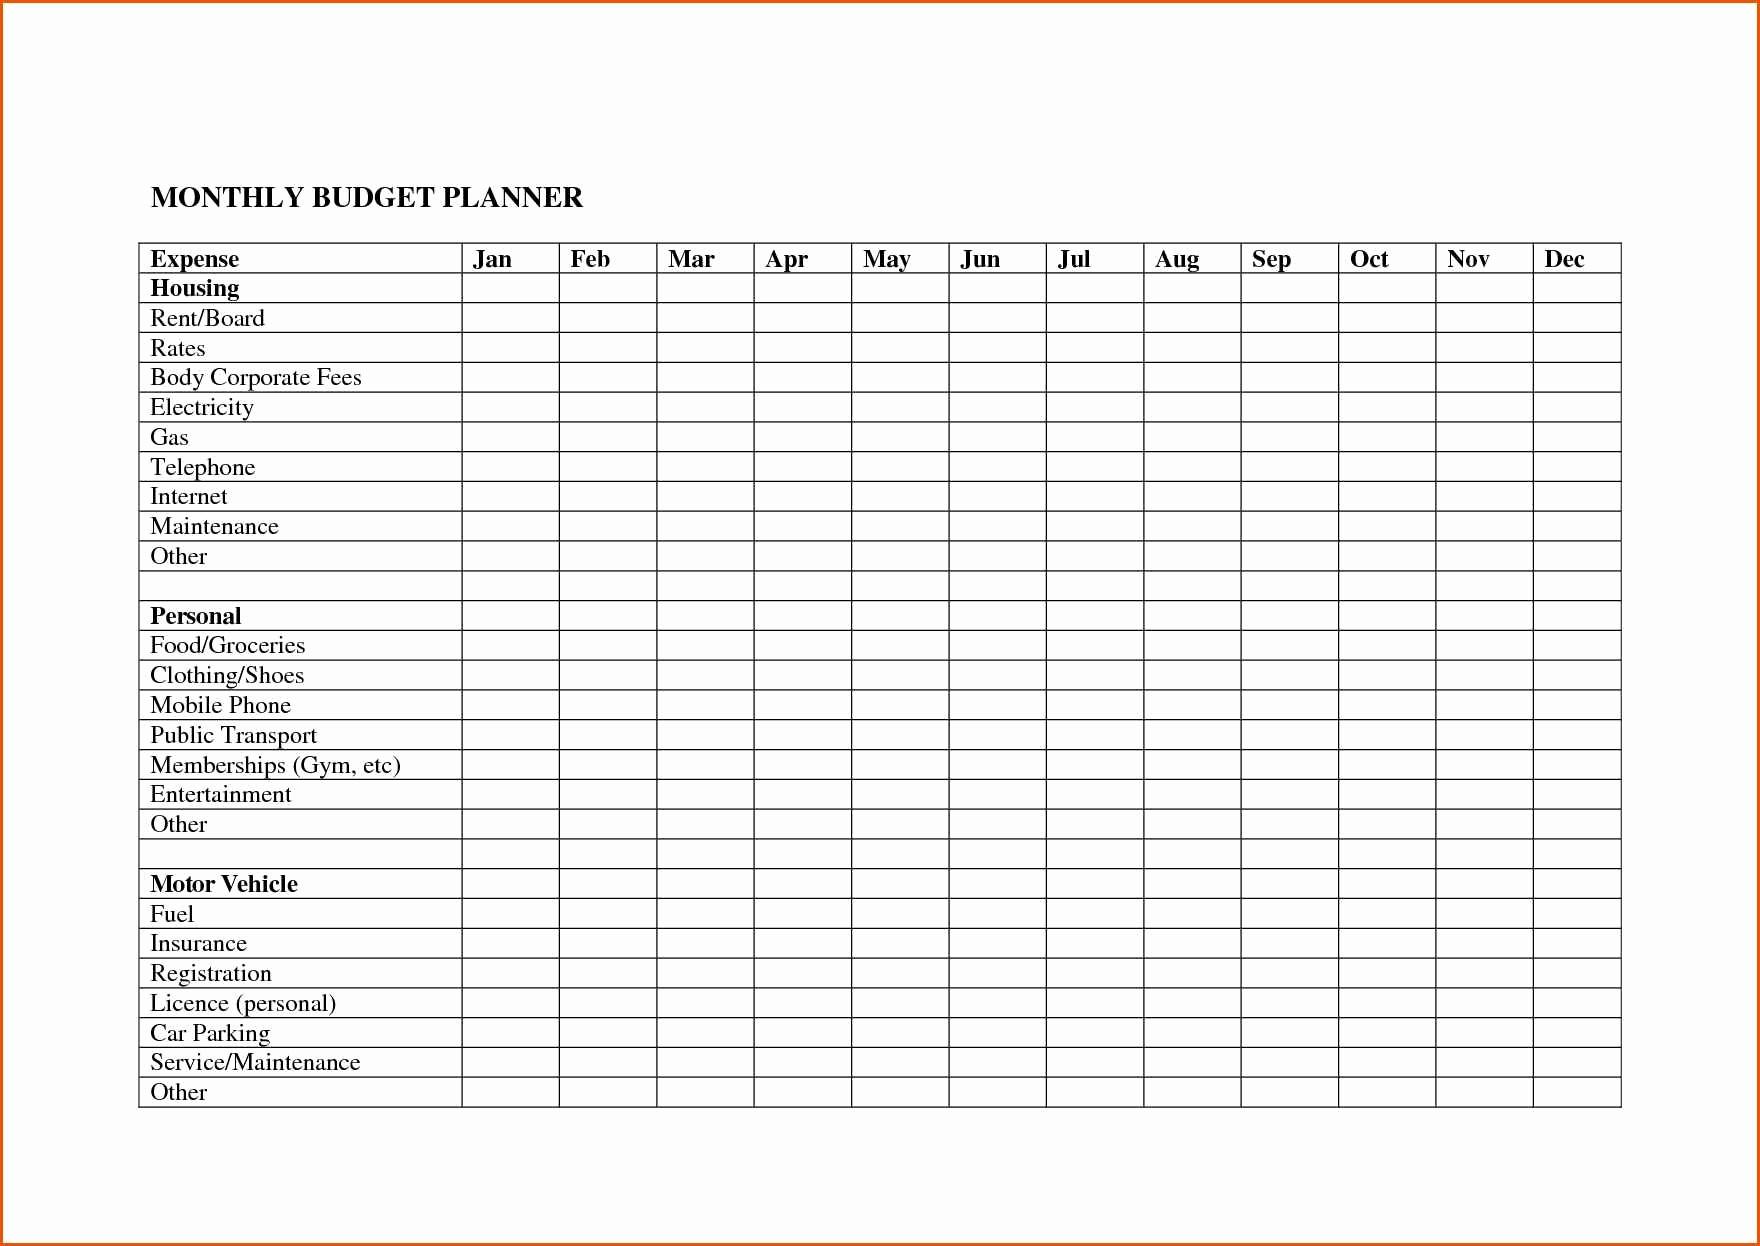 Free Retirement Calculator Excel Spreadsheet Inside Net Present Value Calculator Excel Template Luxury Excel Retirement